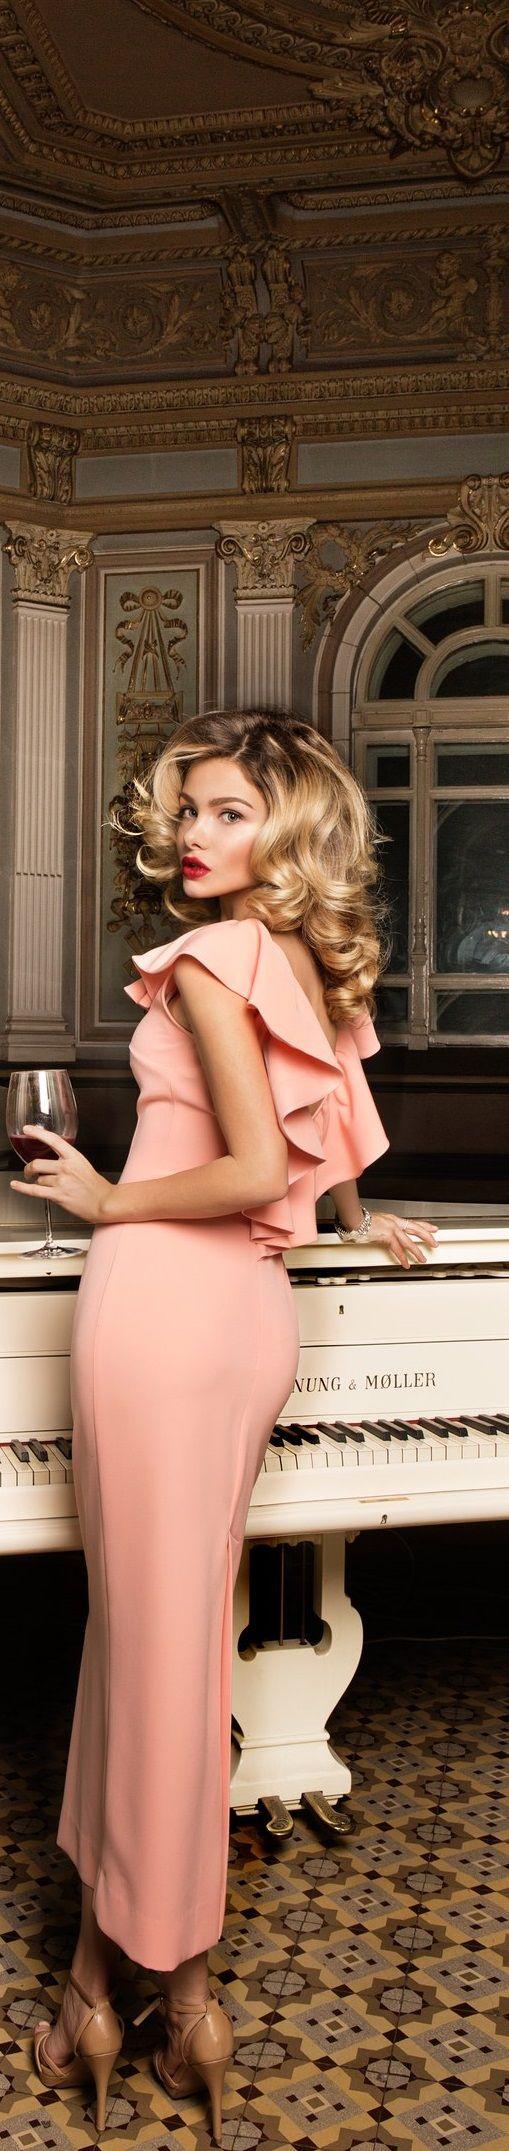 Yulia Prokhorova MBFW Russia women fashion outfit clothing style apparel @roressclothes closet ideas